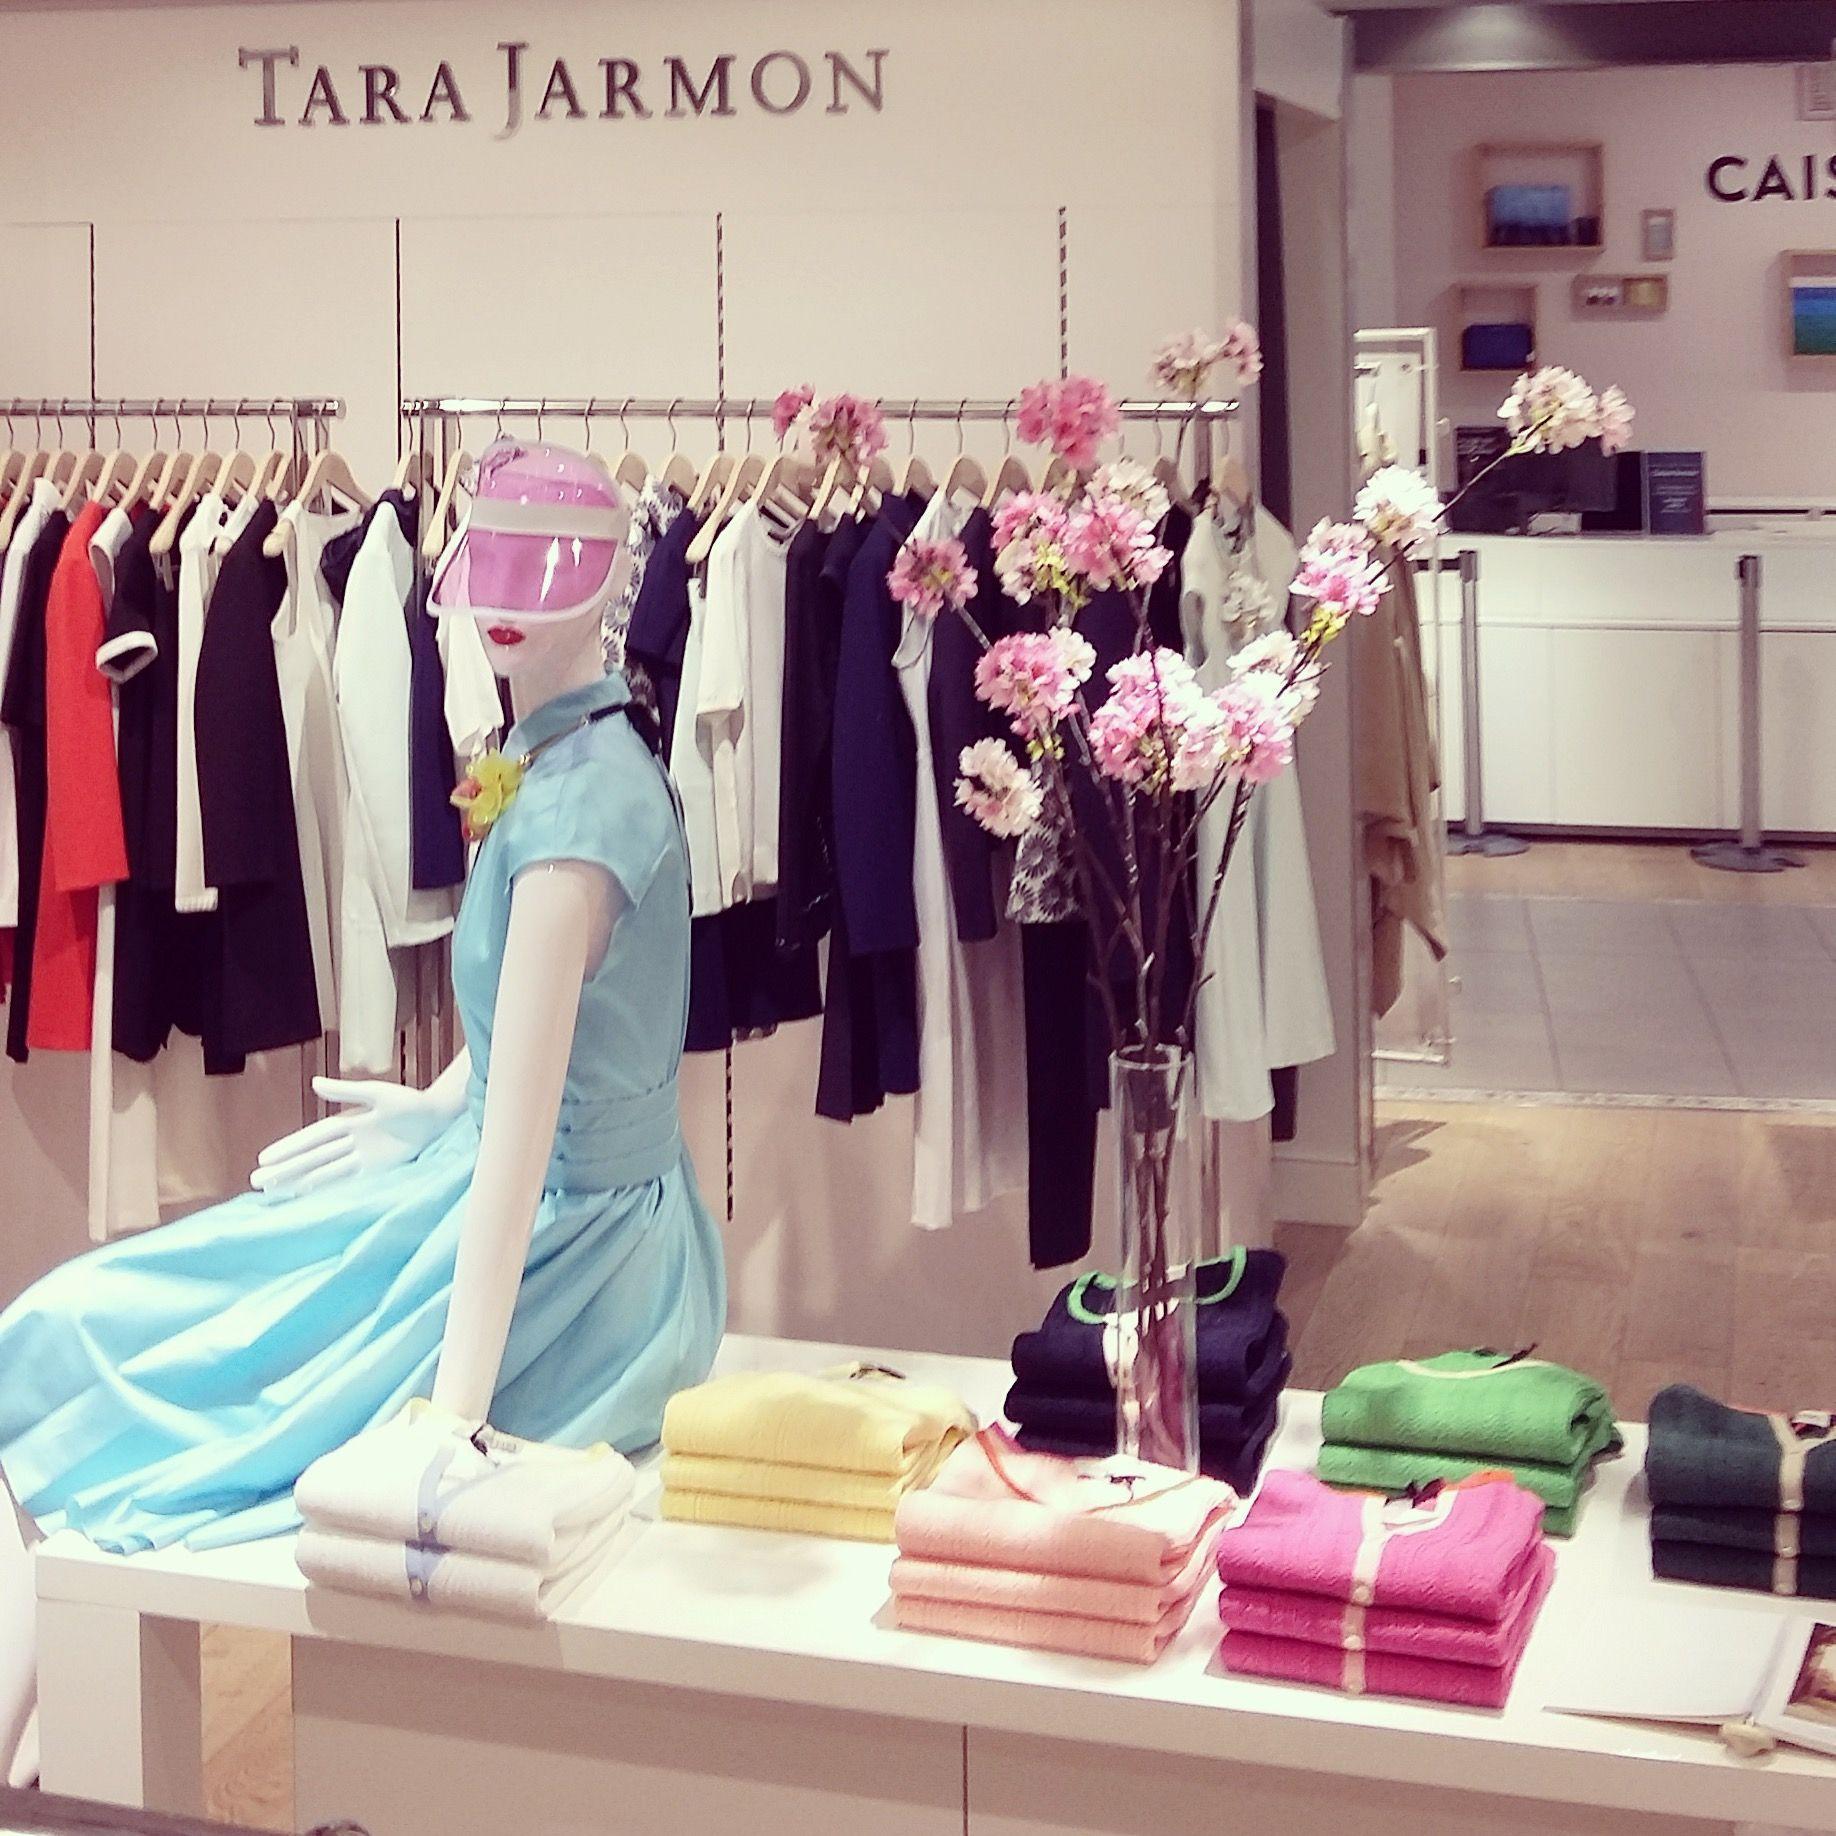 new shop tara jarmon in le bhv marais store 36 rue de la verrerie 75004 paris france. Black Bedroom Furniture Sets. Home Design Ideas